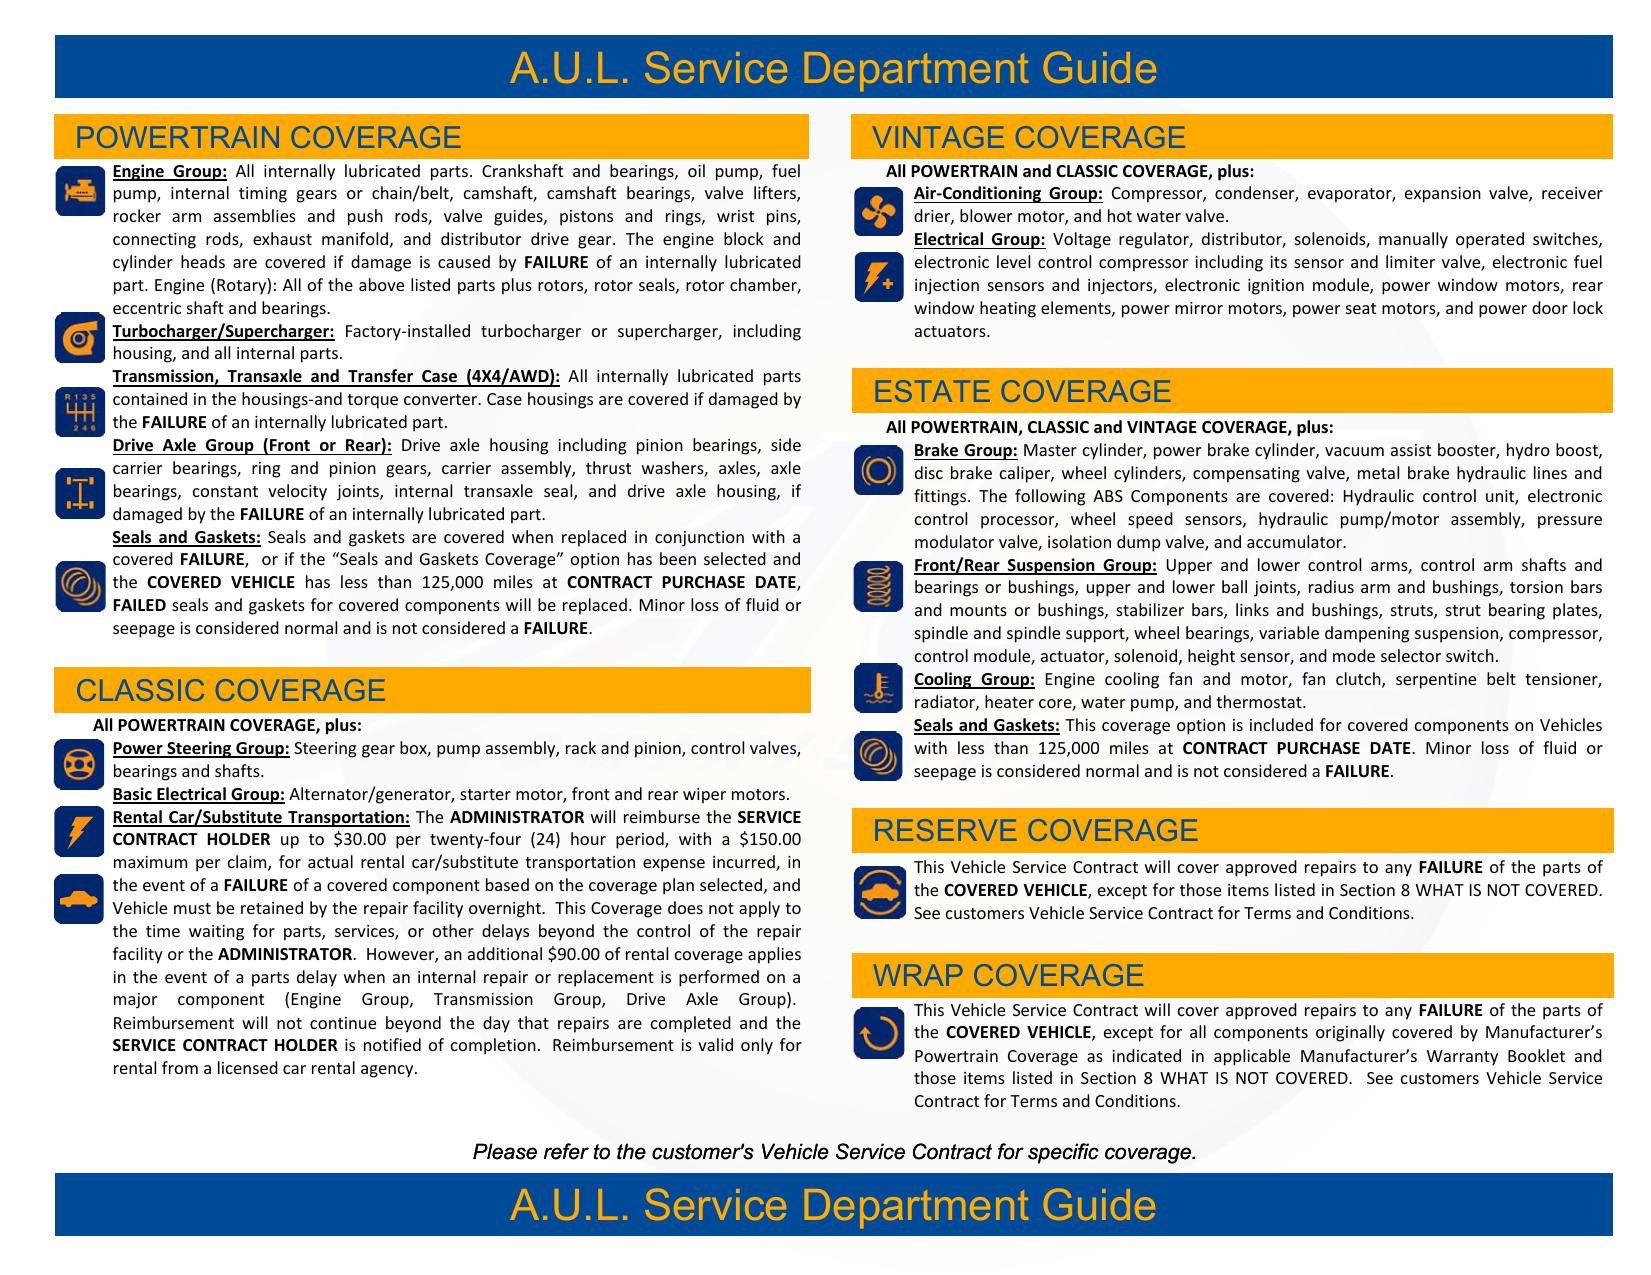 Powertrain Warranty Coverage >> Aul Service Department Guide Manualzz Com